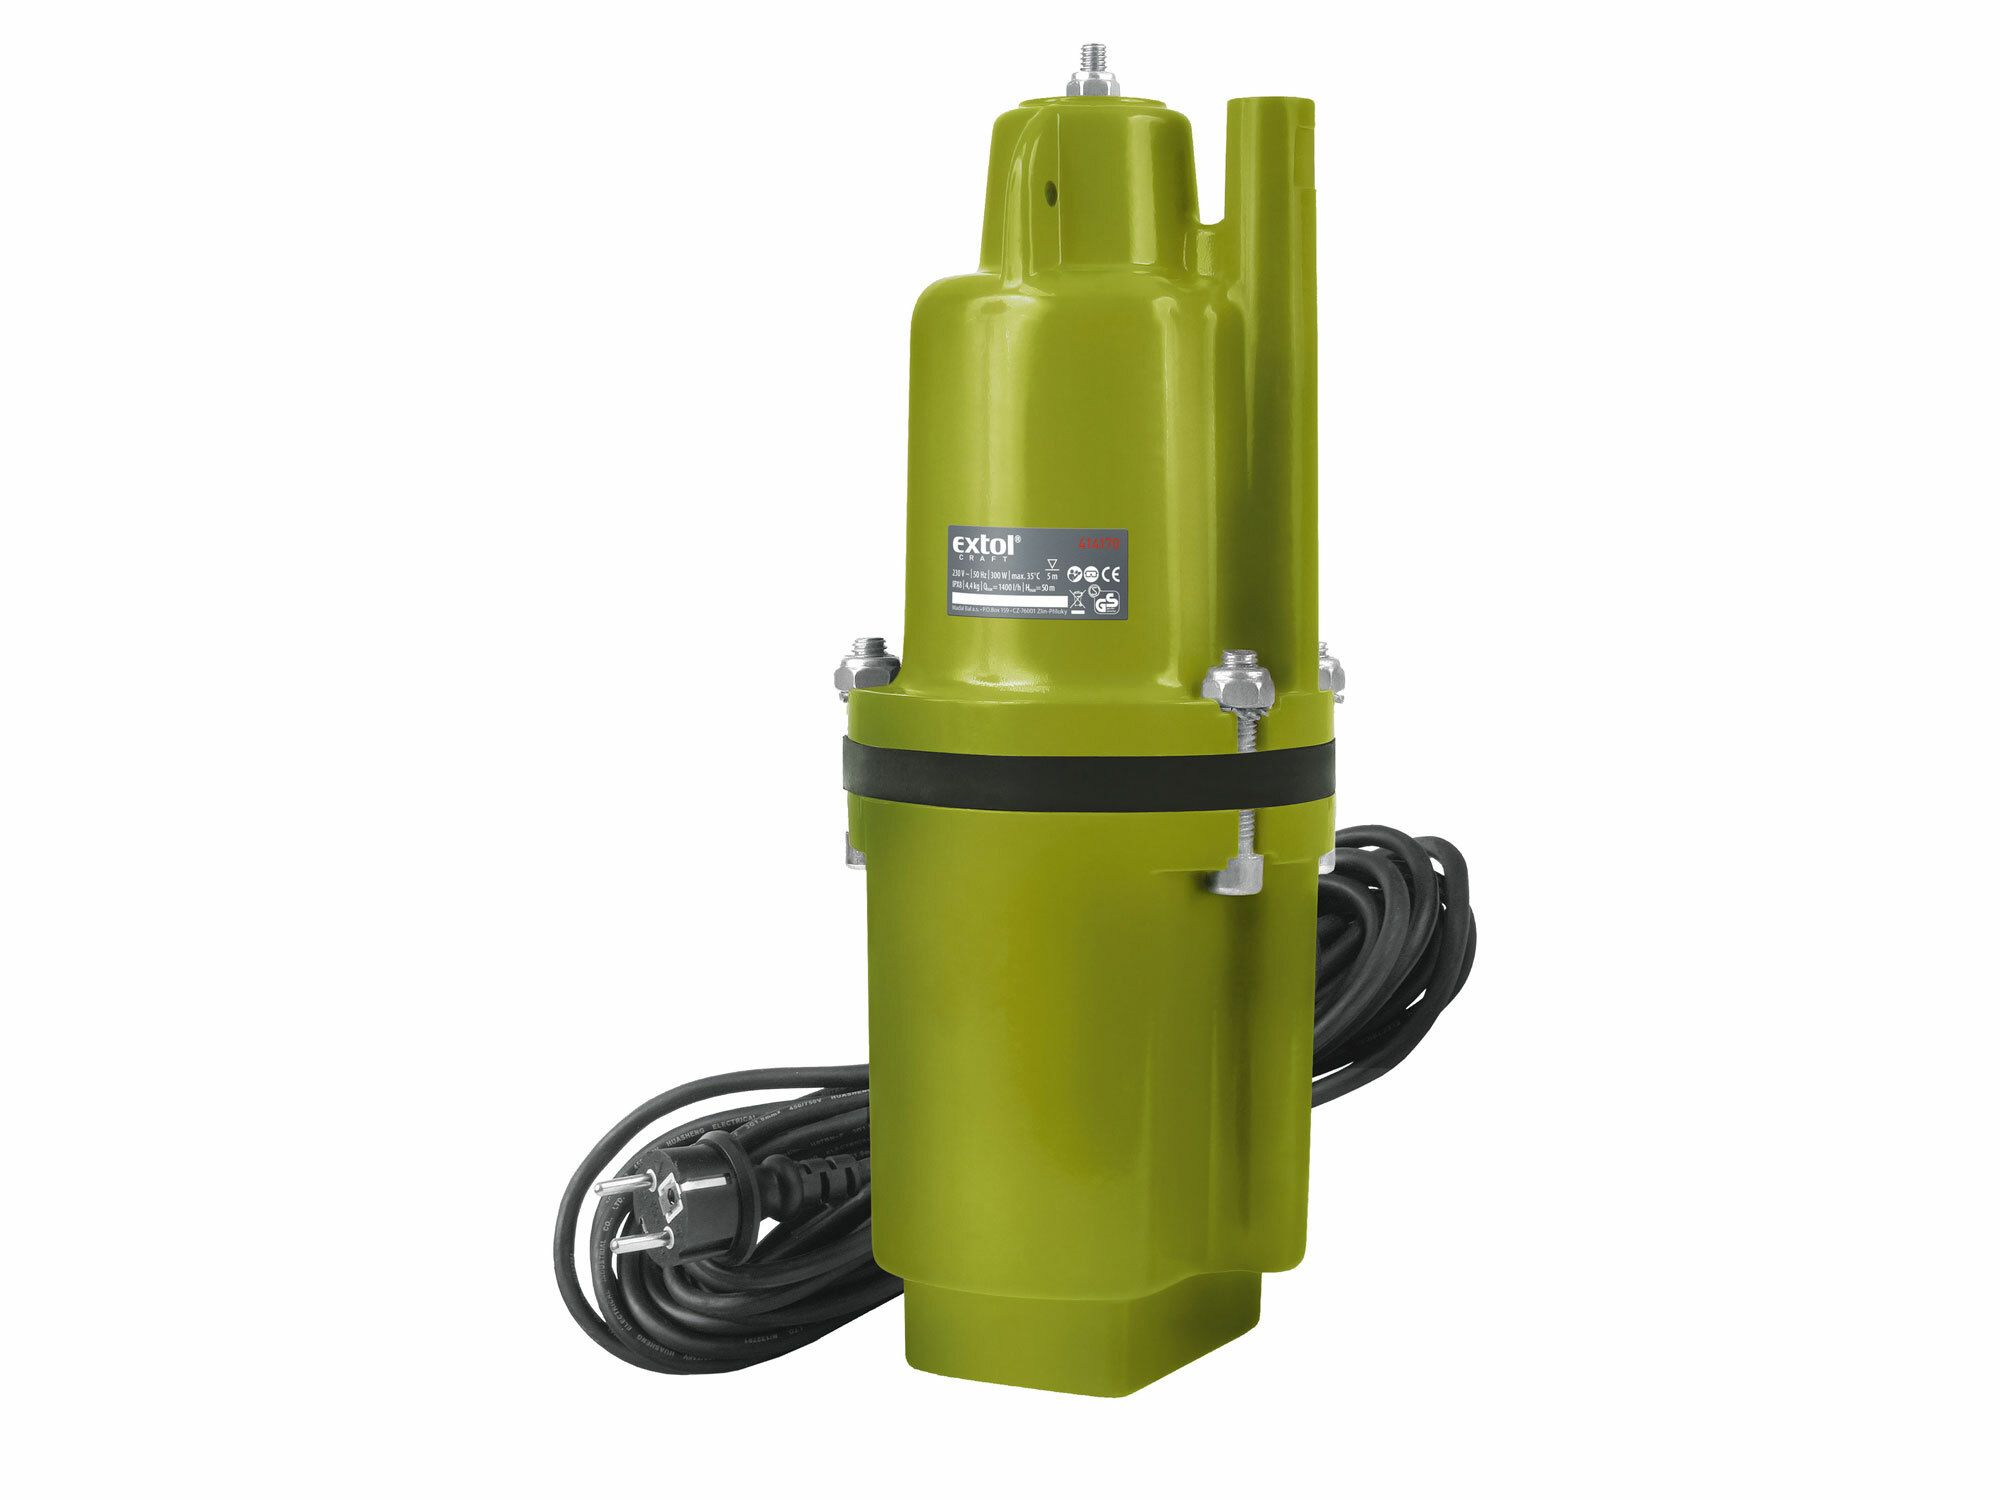 Čerpadlo membránové hlbinné ponorné, 300W, 1400l/hod, 10m, EXTOL CRAFT, 414170